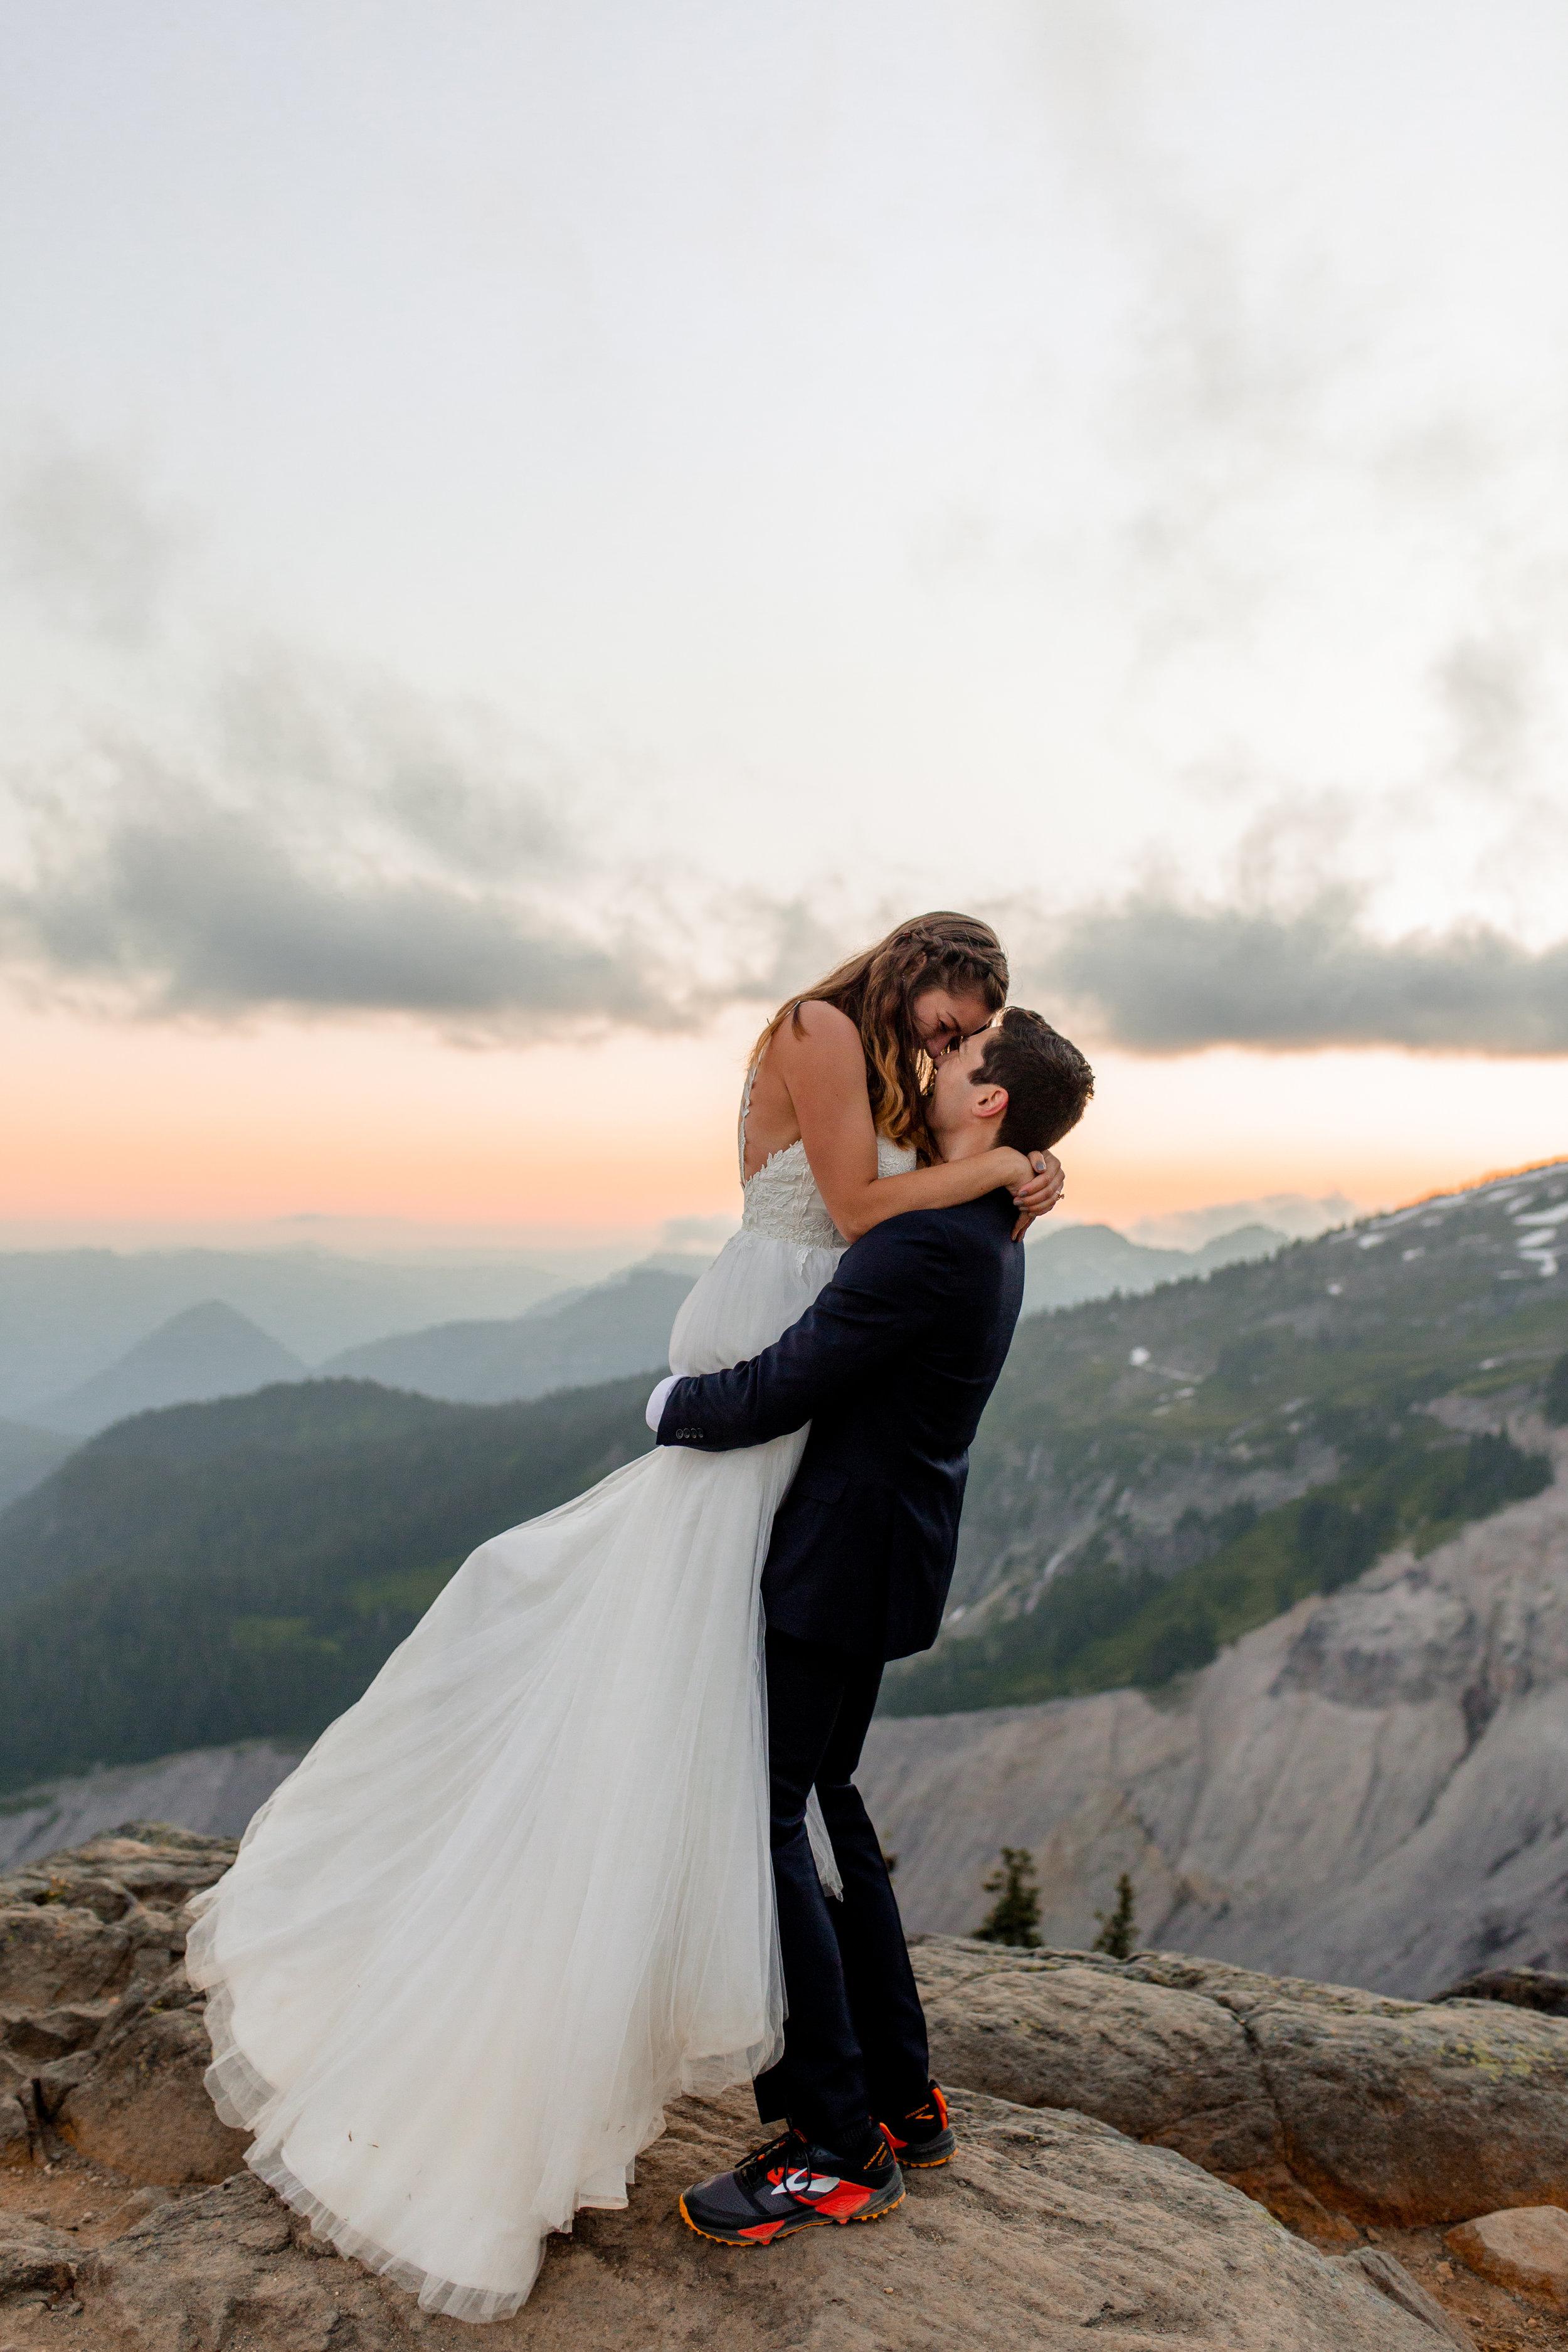 Nicole-Daacke-Photography-Mt-Rainier-elopement-photographer-washington-mountain-epic-wedding-photography-wildflowers-at-rainier-pine-tree-cloudy-summer-day-at-mountain-rainier-64.jpg